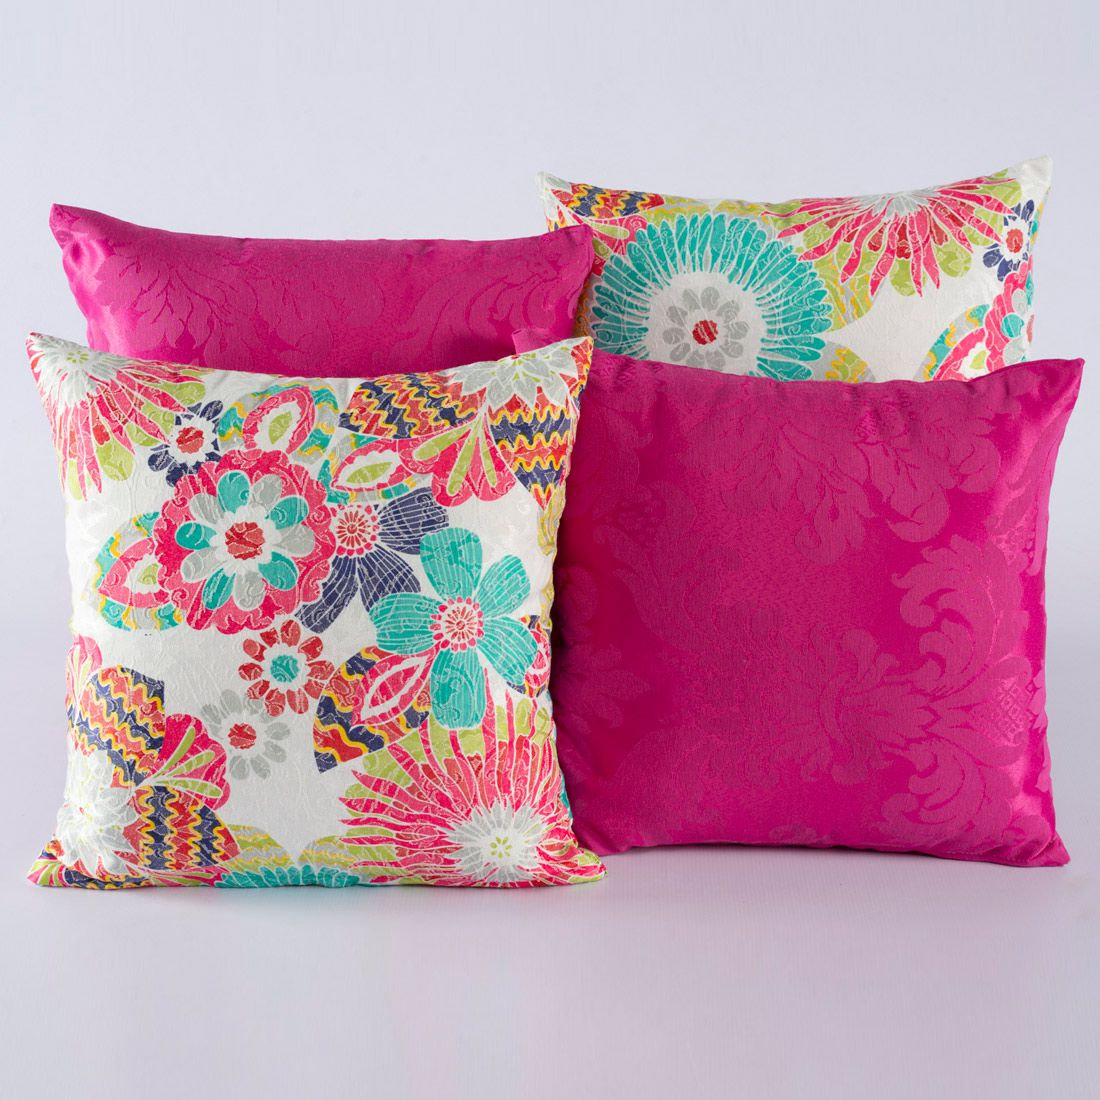 Kit c/ 4 Almofadas Cheias Decorativas Floral Colorido/Pink 04 Peças c/ Refil